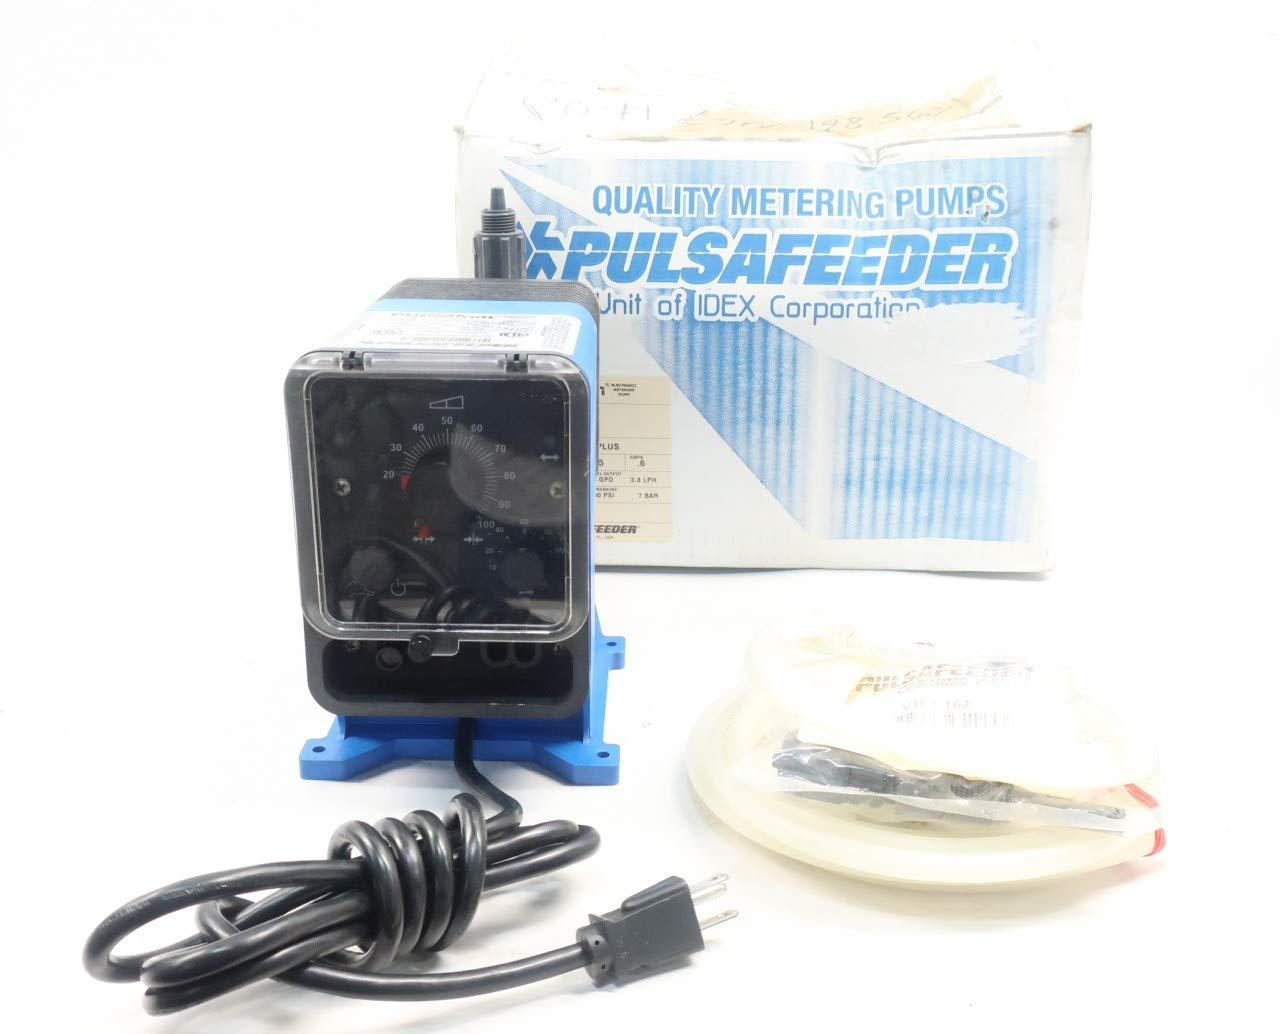 PULSAFEEDER LPB4SA-VTC1-162 PULSATRON METERING Pump 24GPD 100PSI 115V-AC